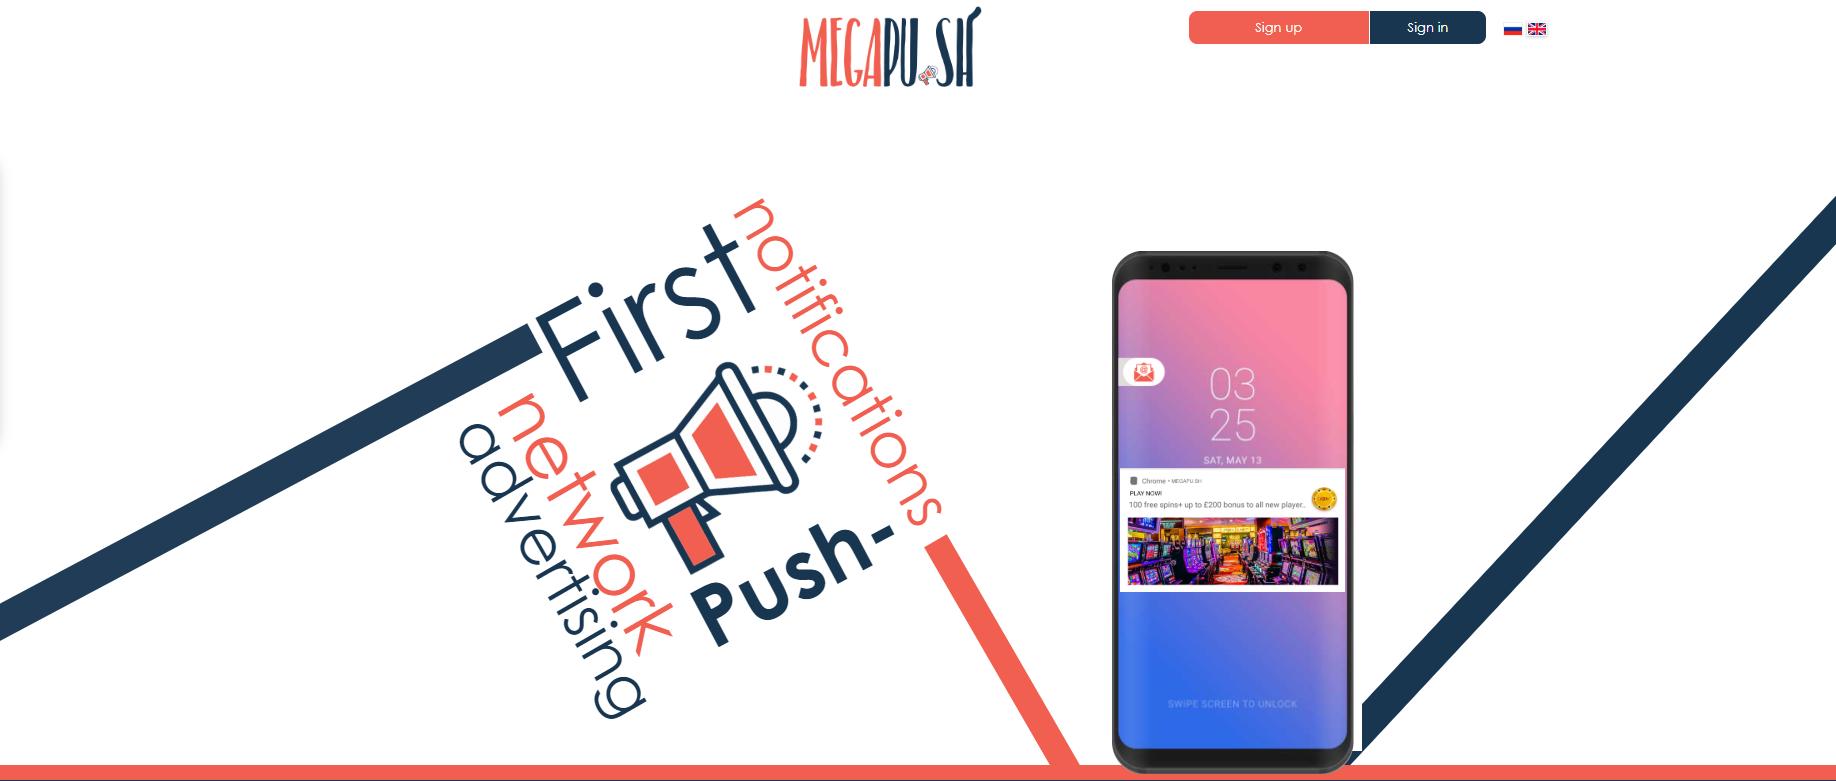 MegaPush Review- Advertising Network Push Notifications